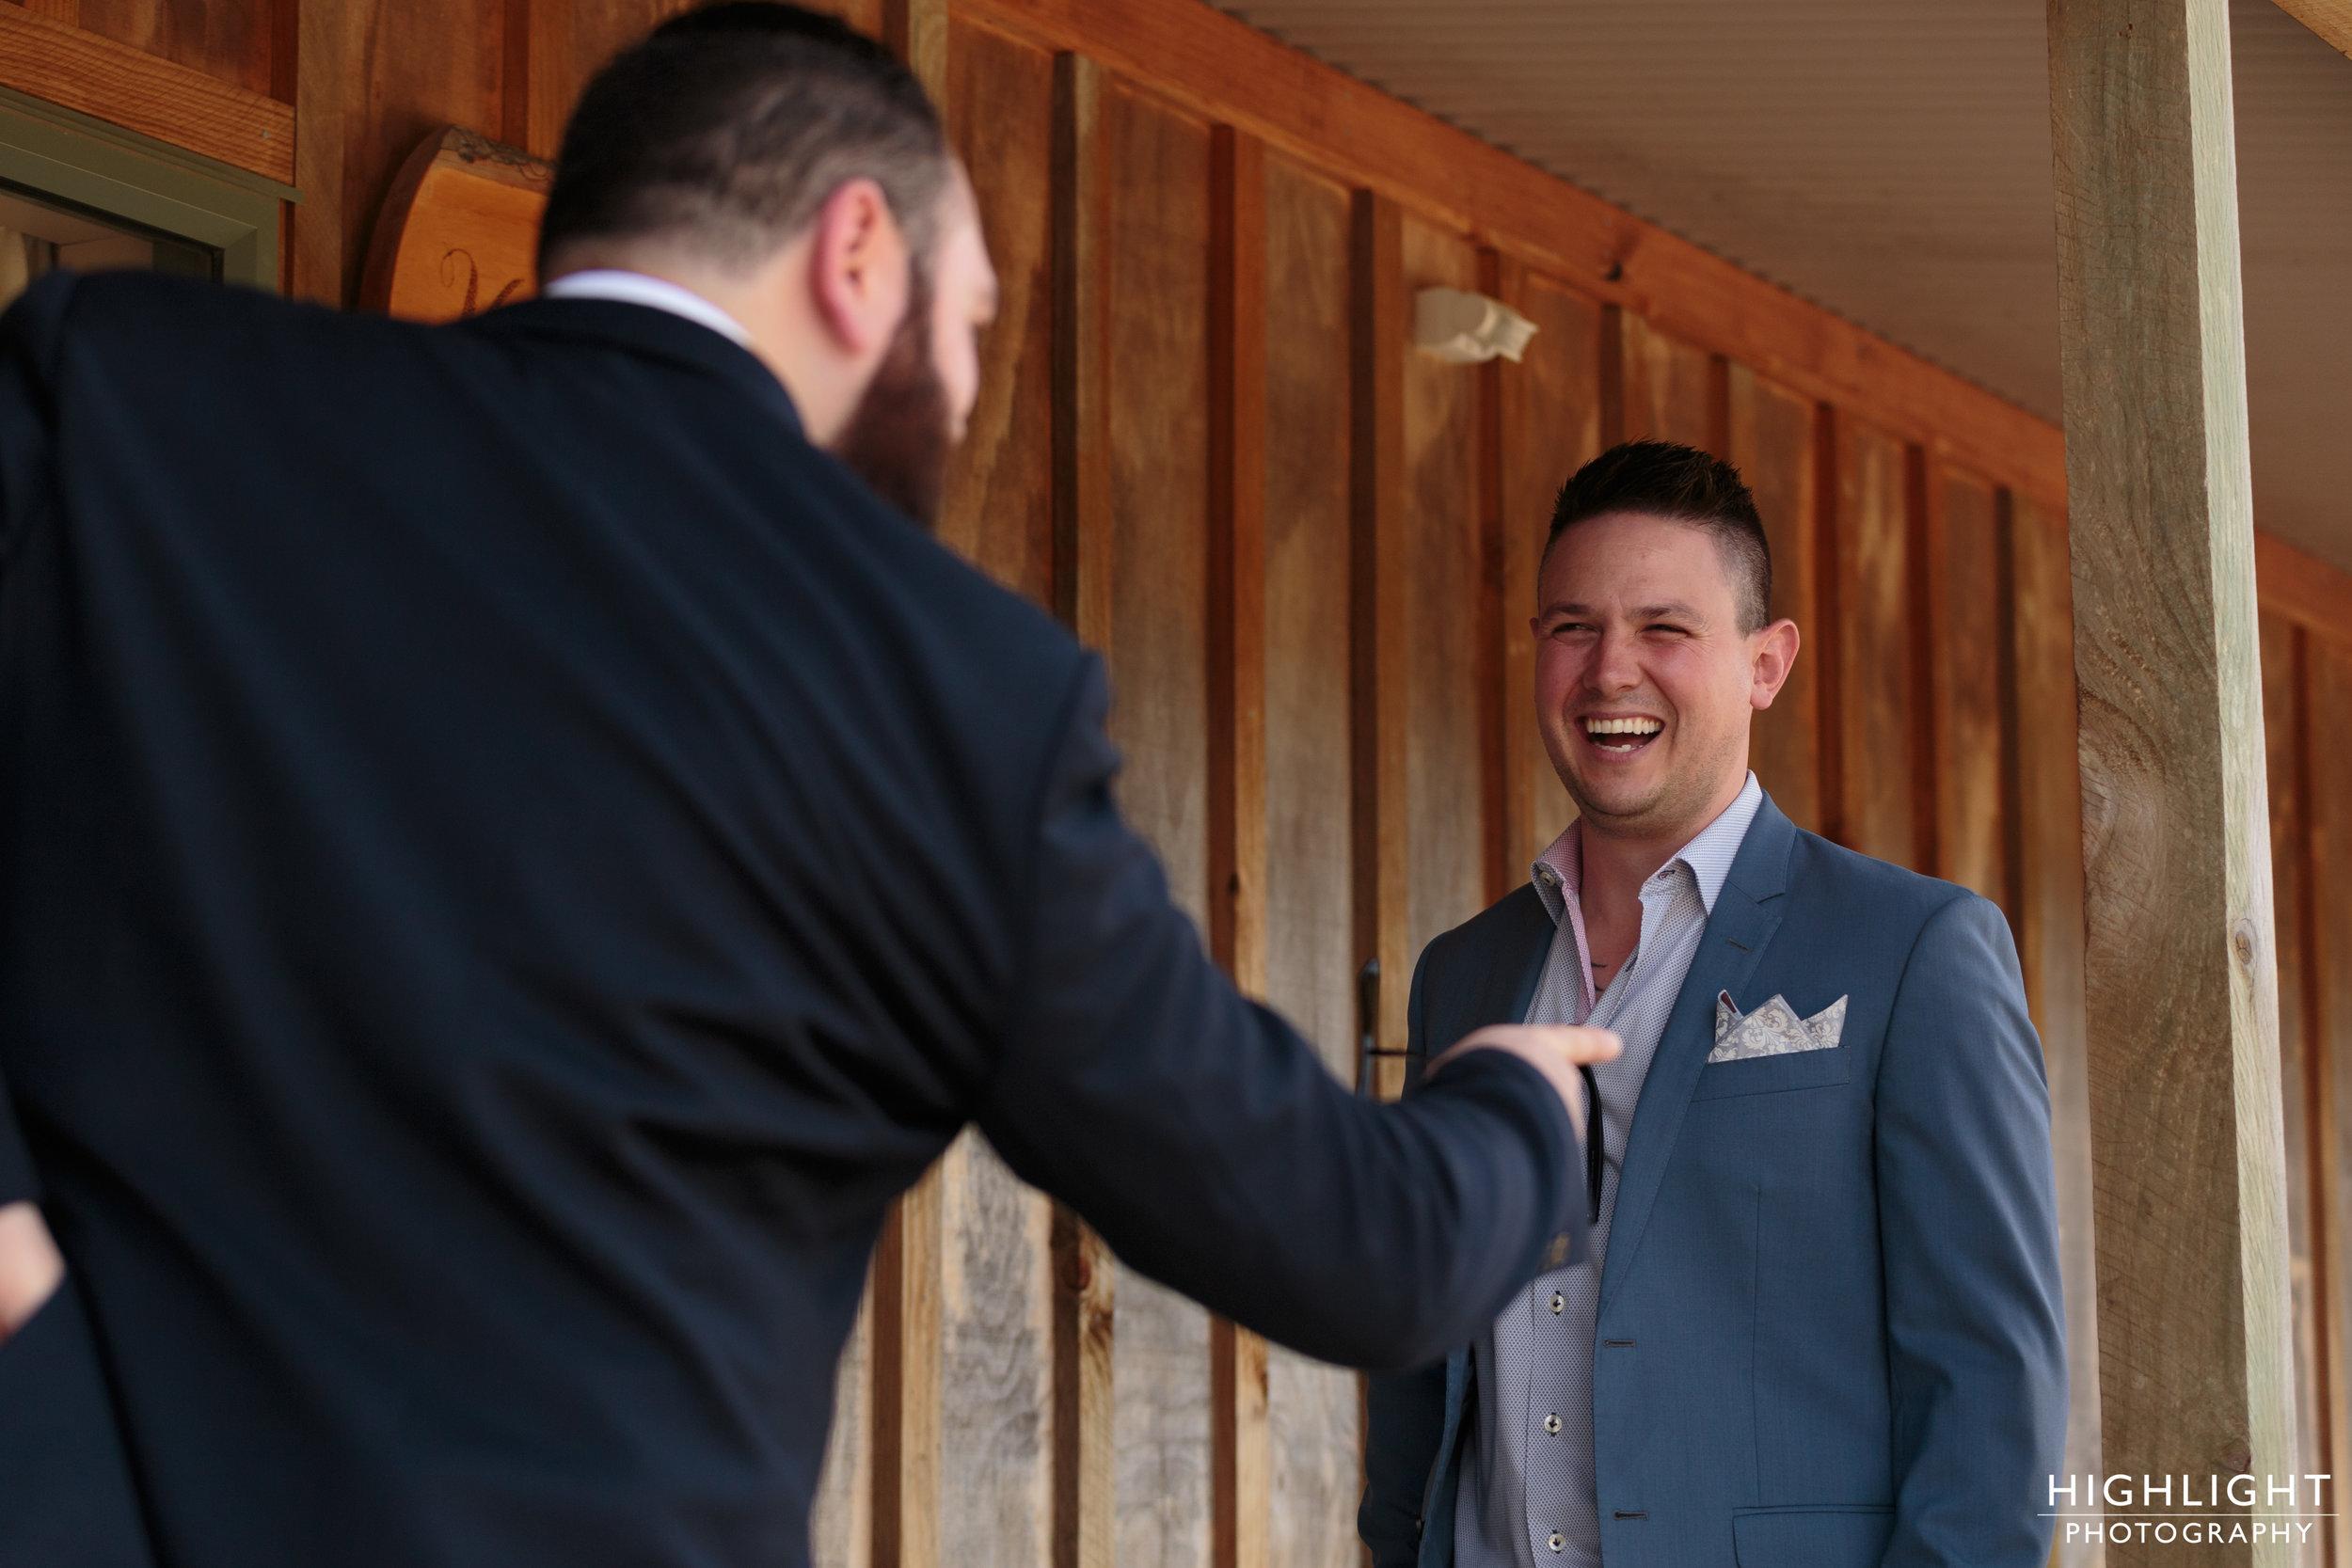 highlight-wedding-photography-new-zealand-makoura-lodge-wedding-32.jpg